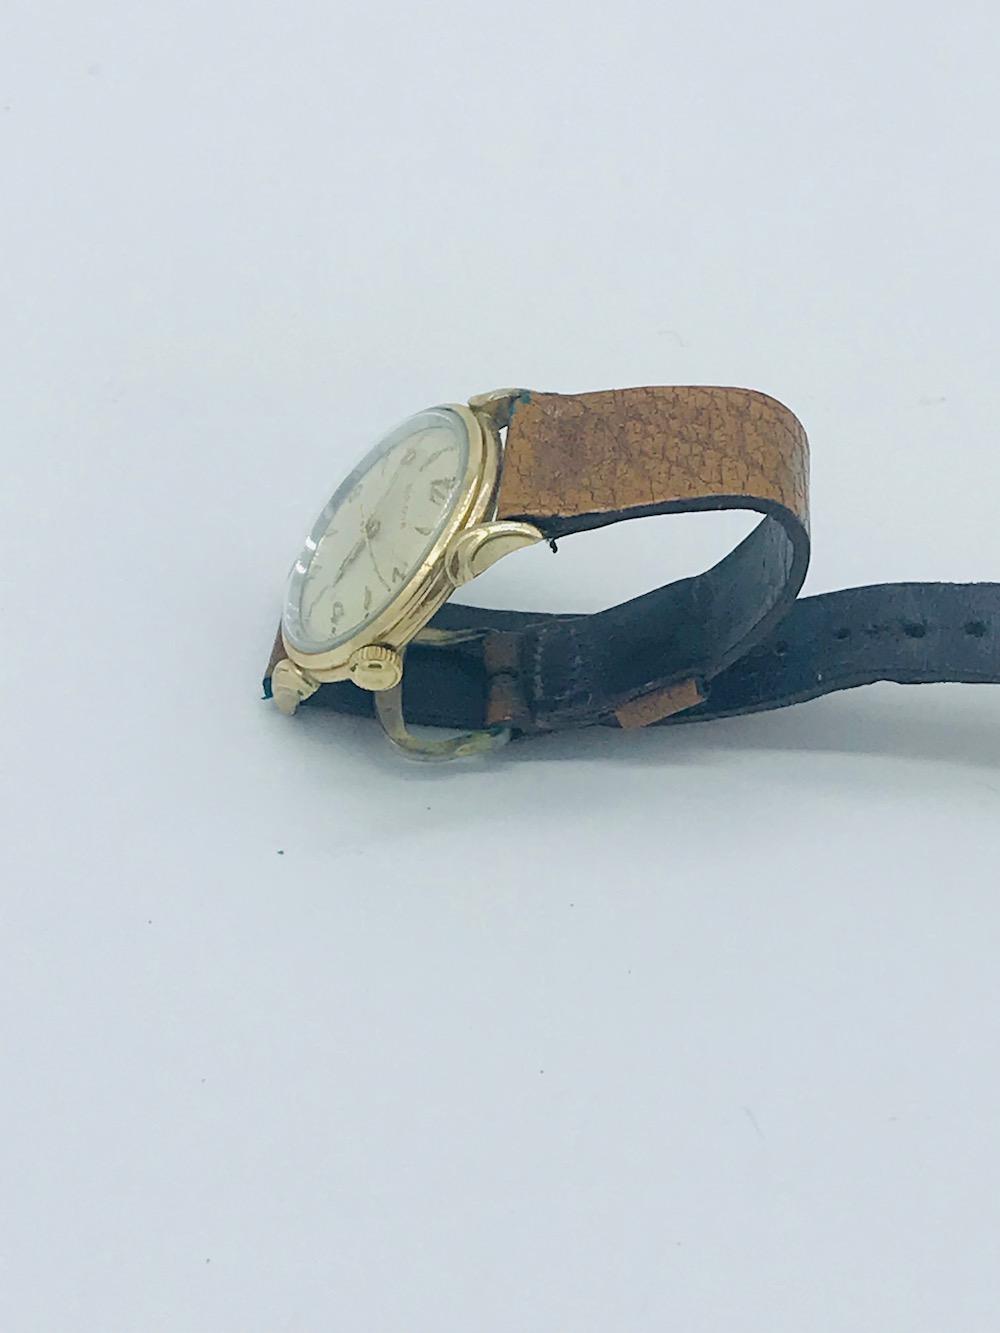 Lot 8632: BULOVA, Swiss Automatic 1950's Vintage 31 mm Watch